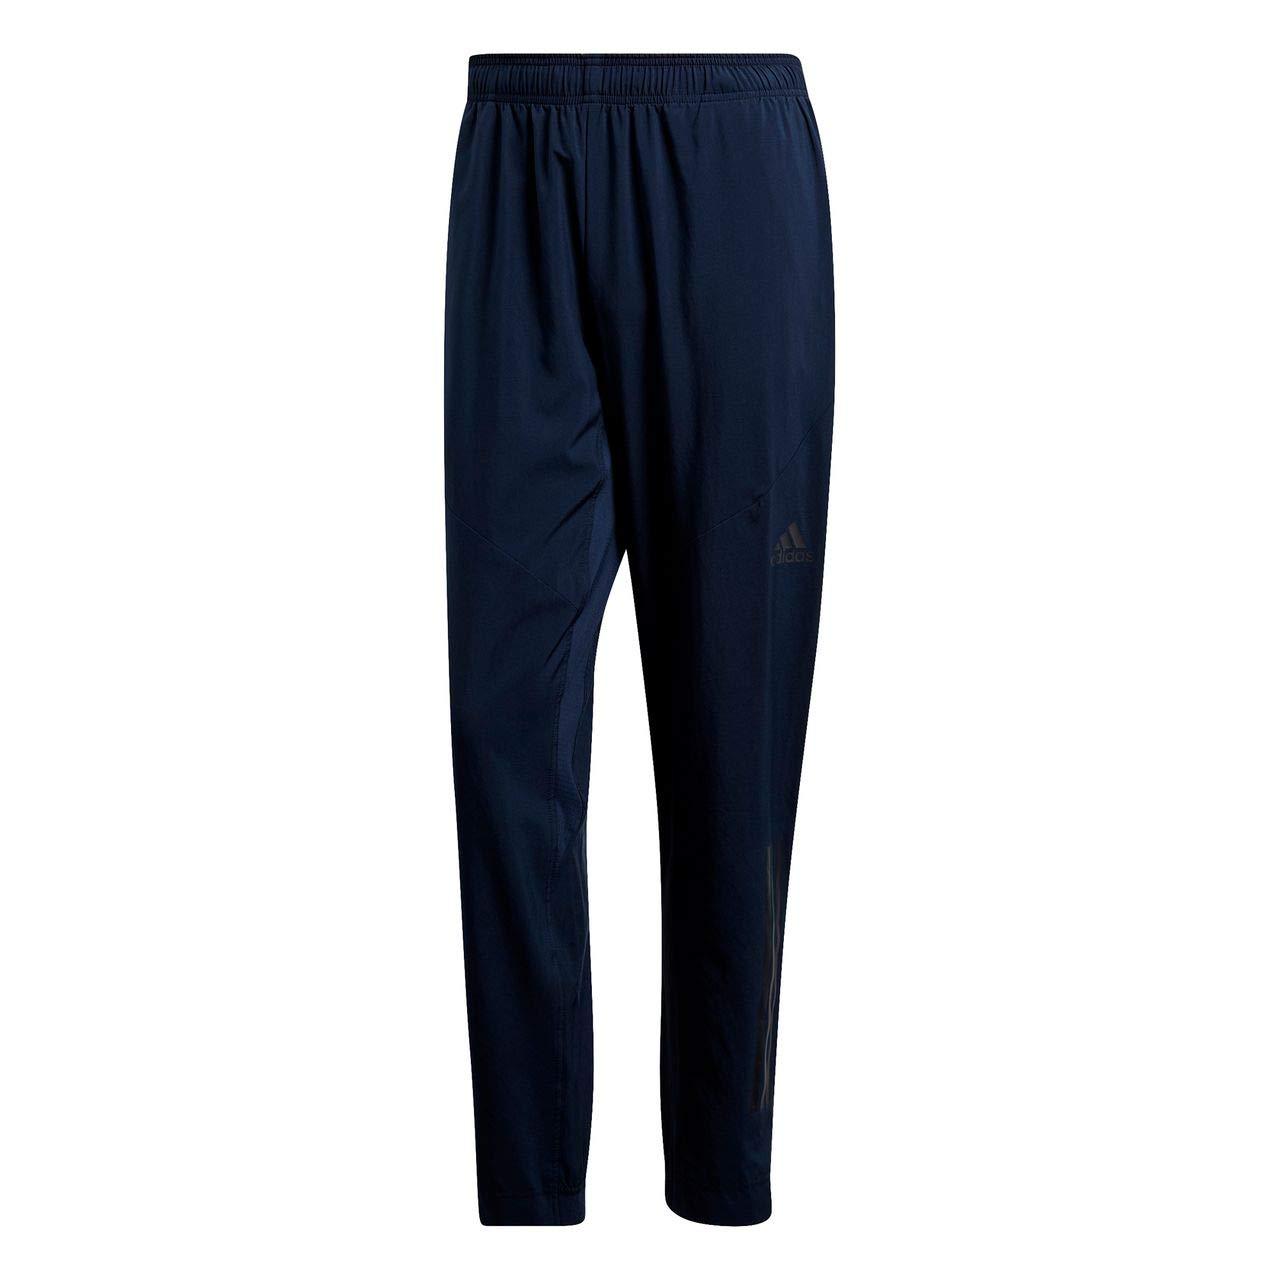 Adidas da Uomo Wo PA ccool WV Training Pantaloni CG1506